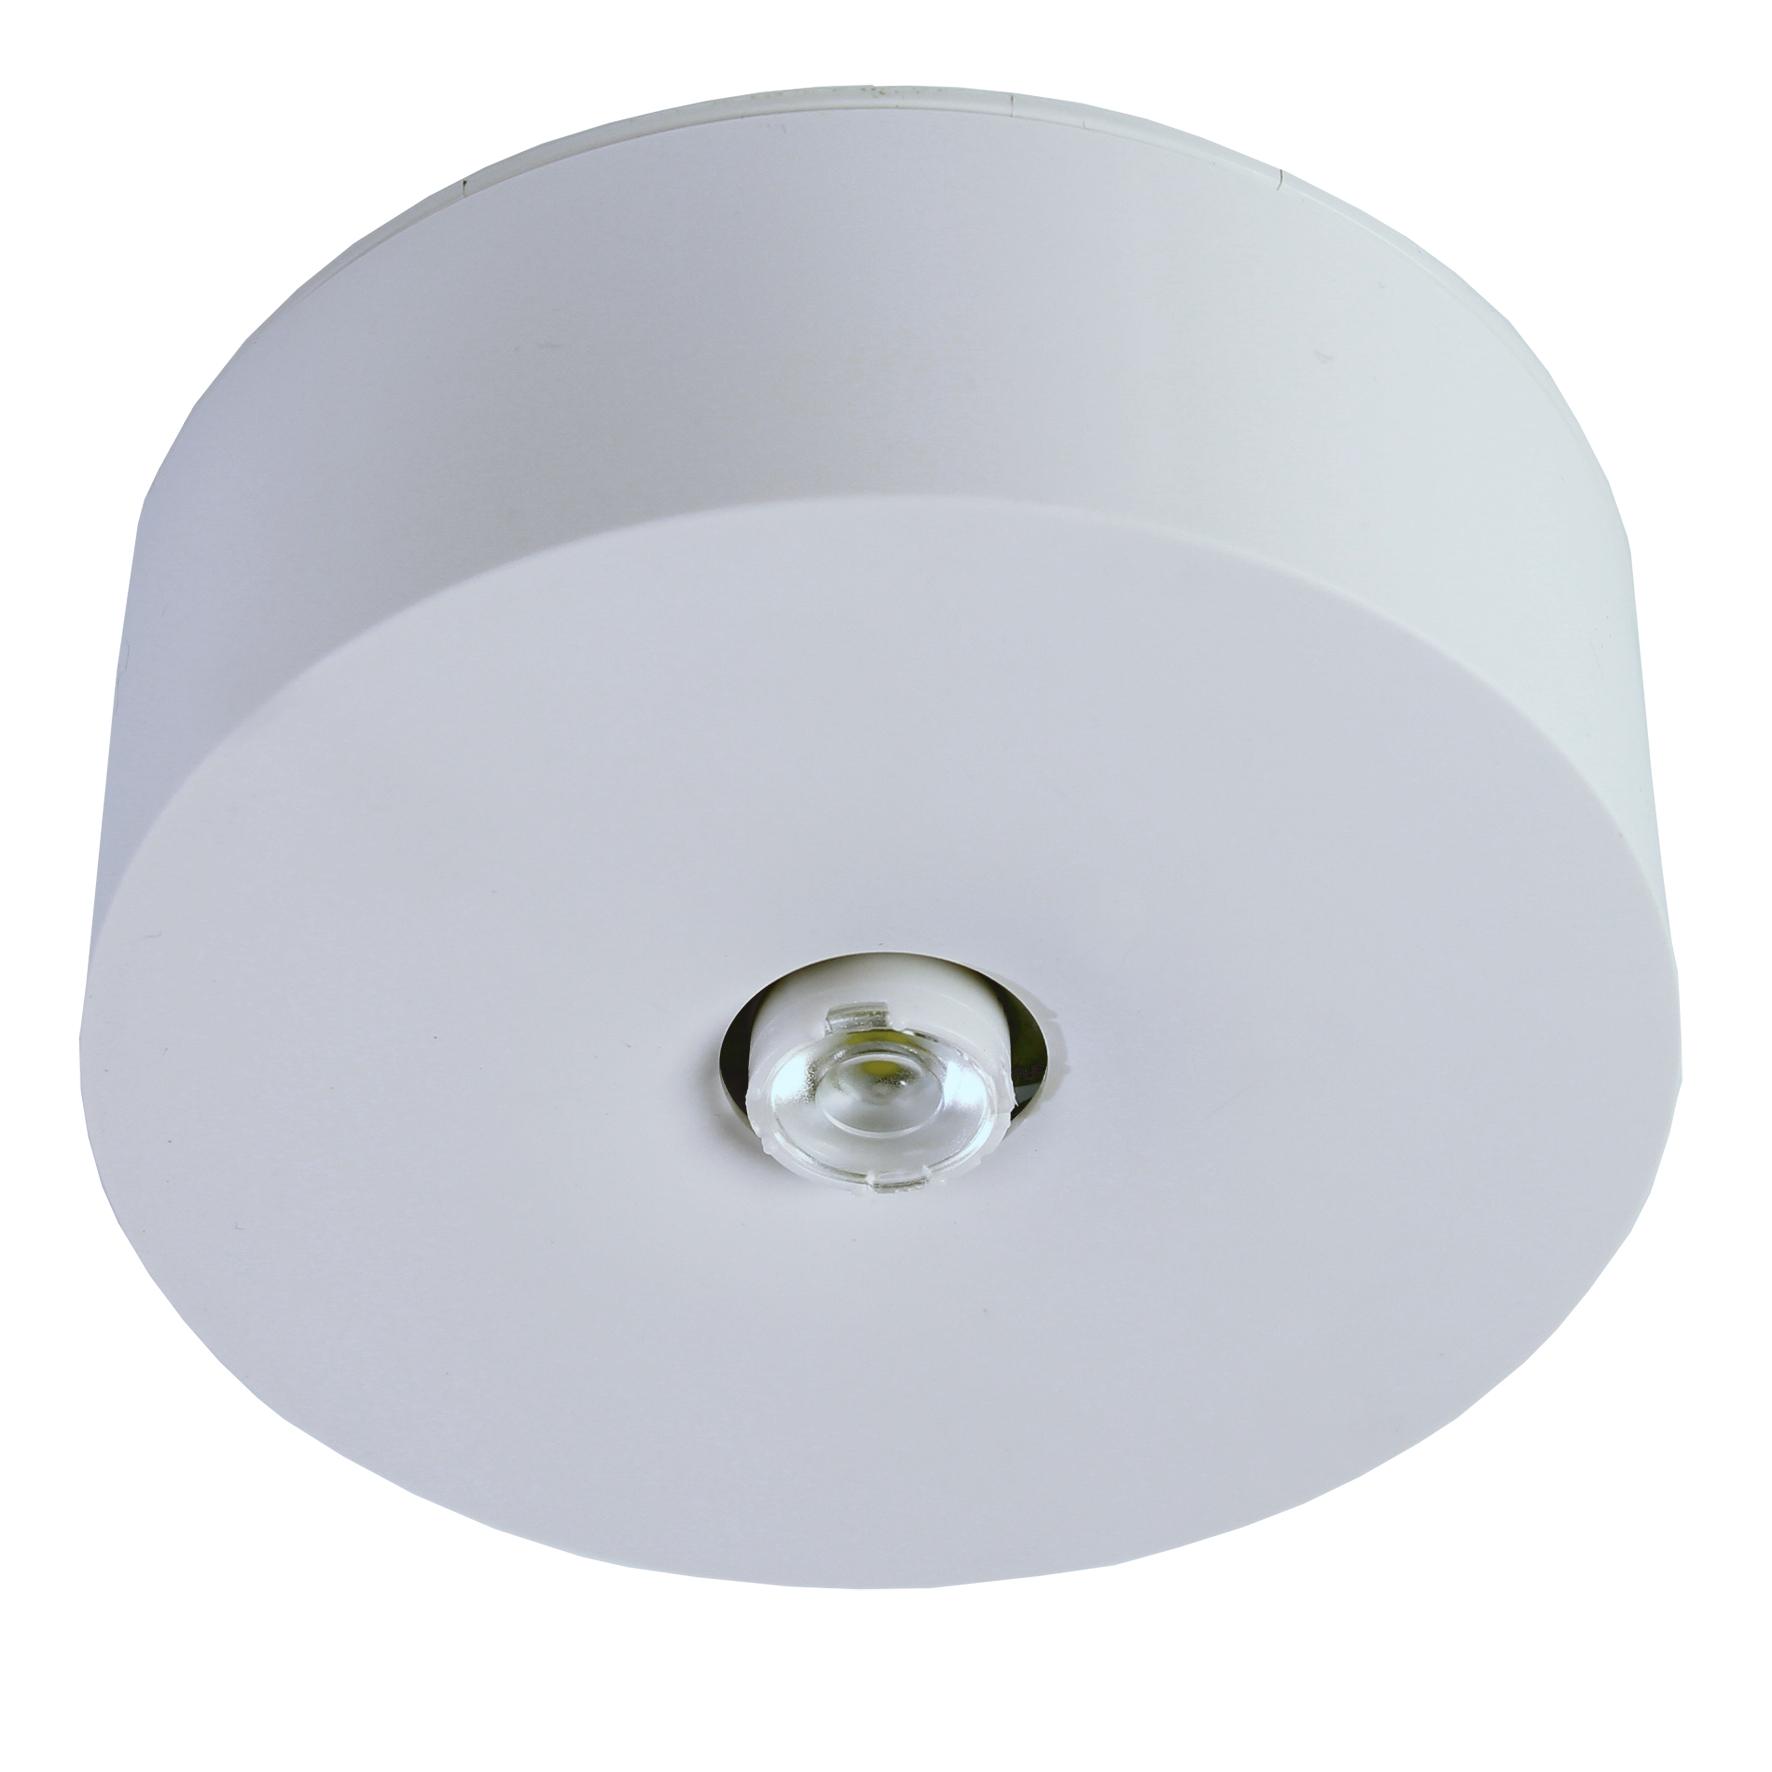 1 Stk Notleuchte IL  1x3W ERT-LED 230V EL Spot Deckenanbaumontage NLILDS029E